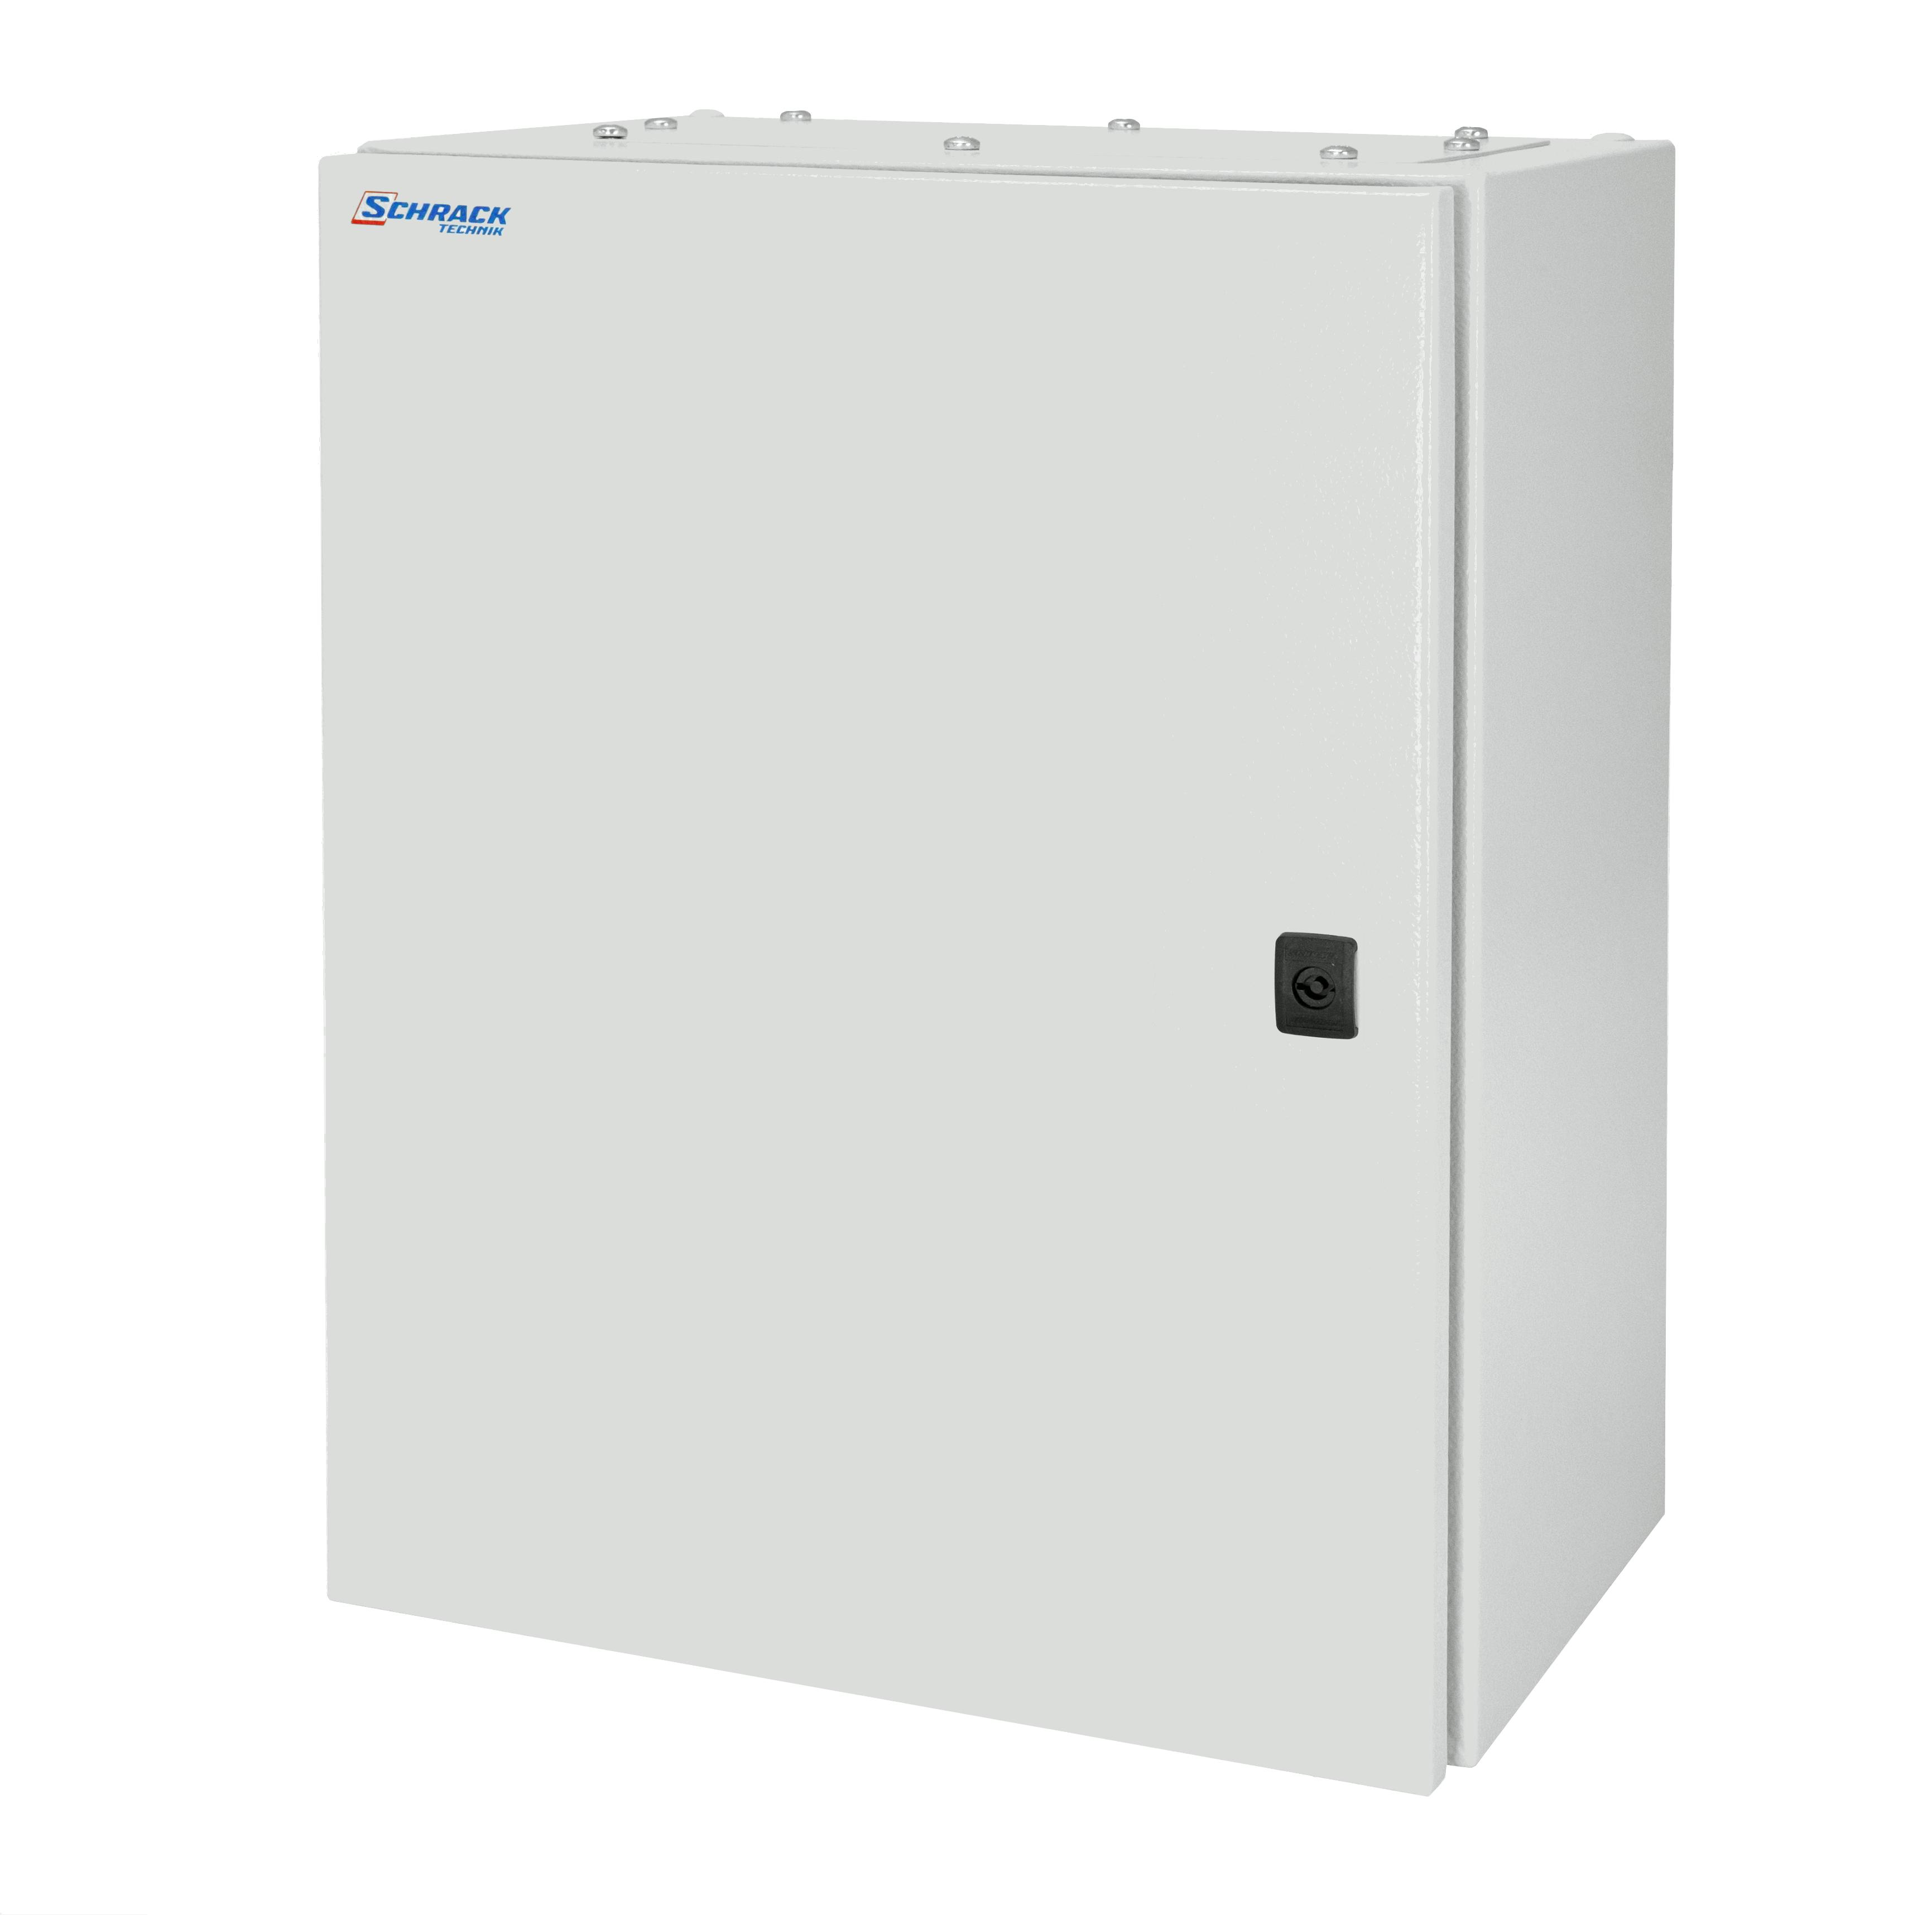 1 Stk Wandschrank Mono IP66 H=300 B=250 T=210 Stahlblech WSM3025210